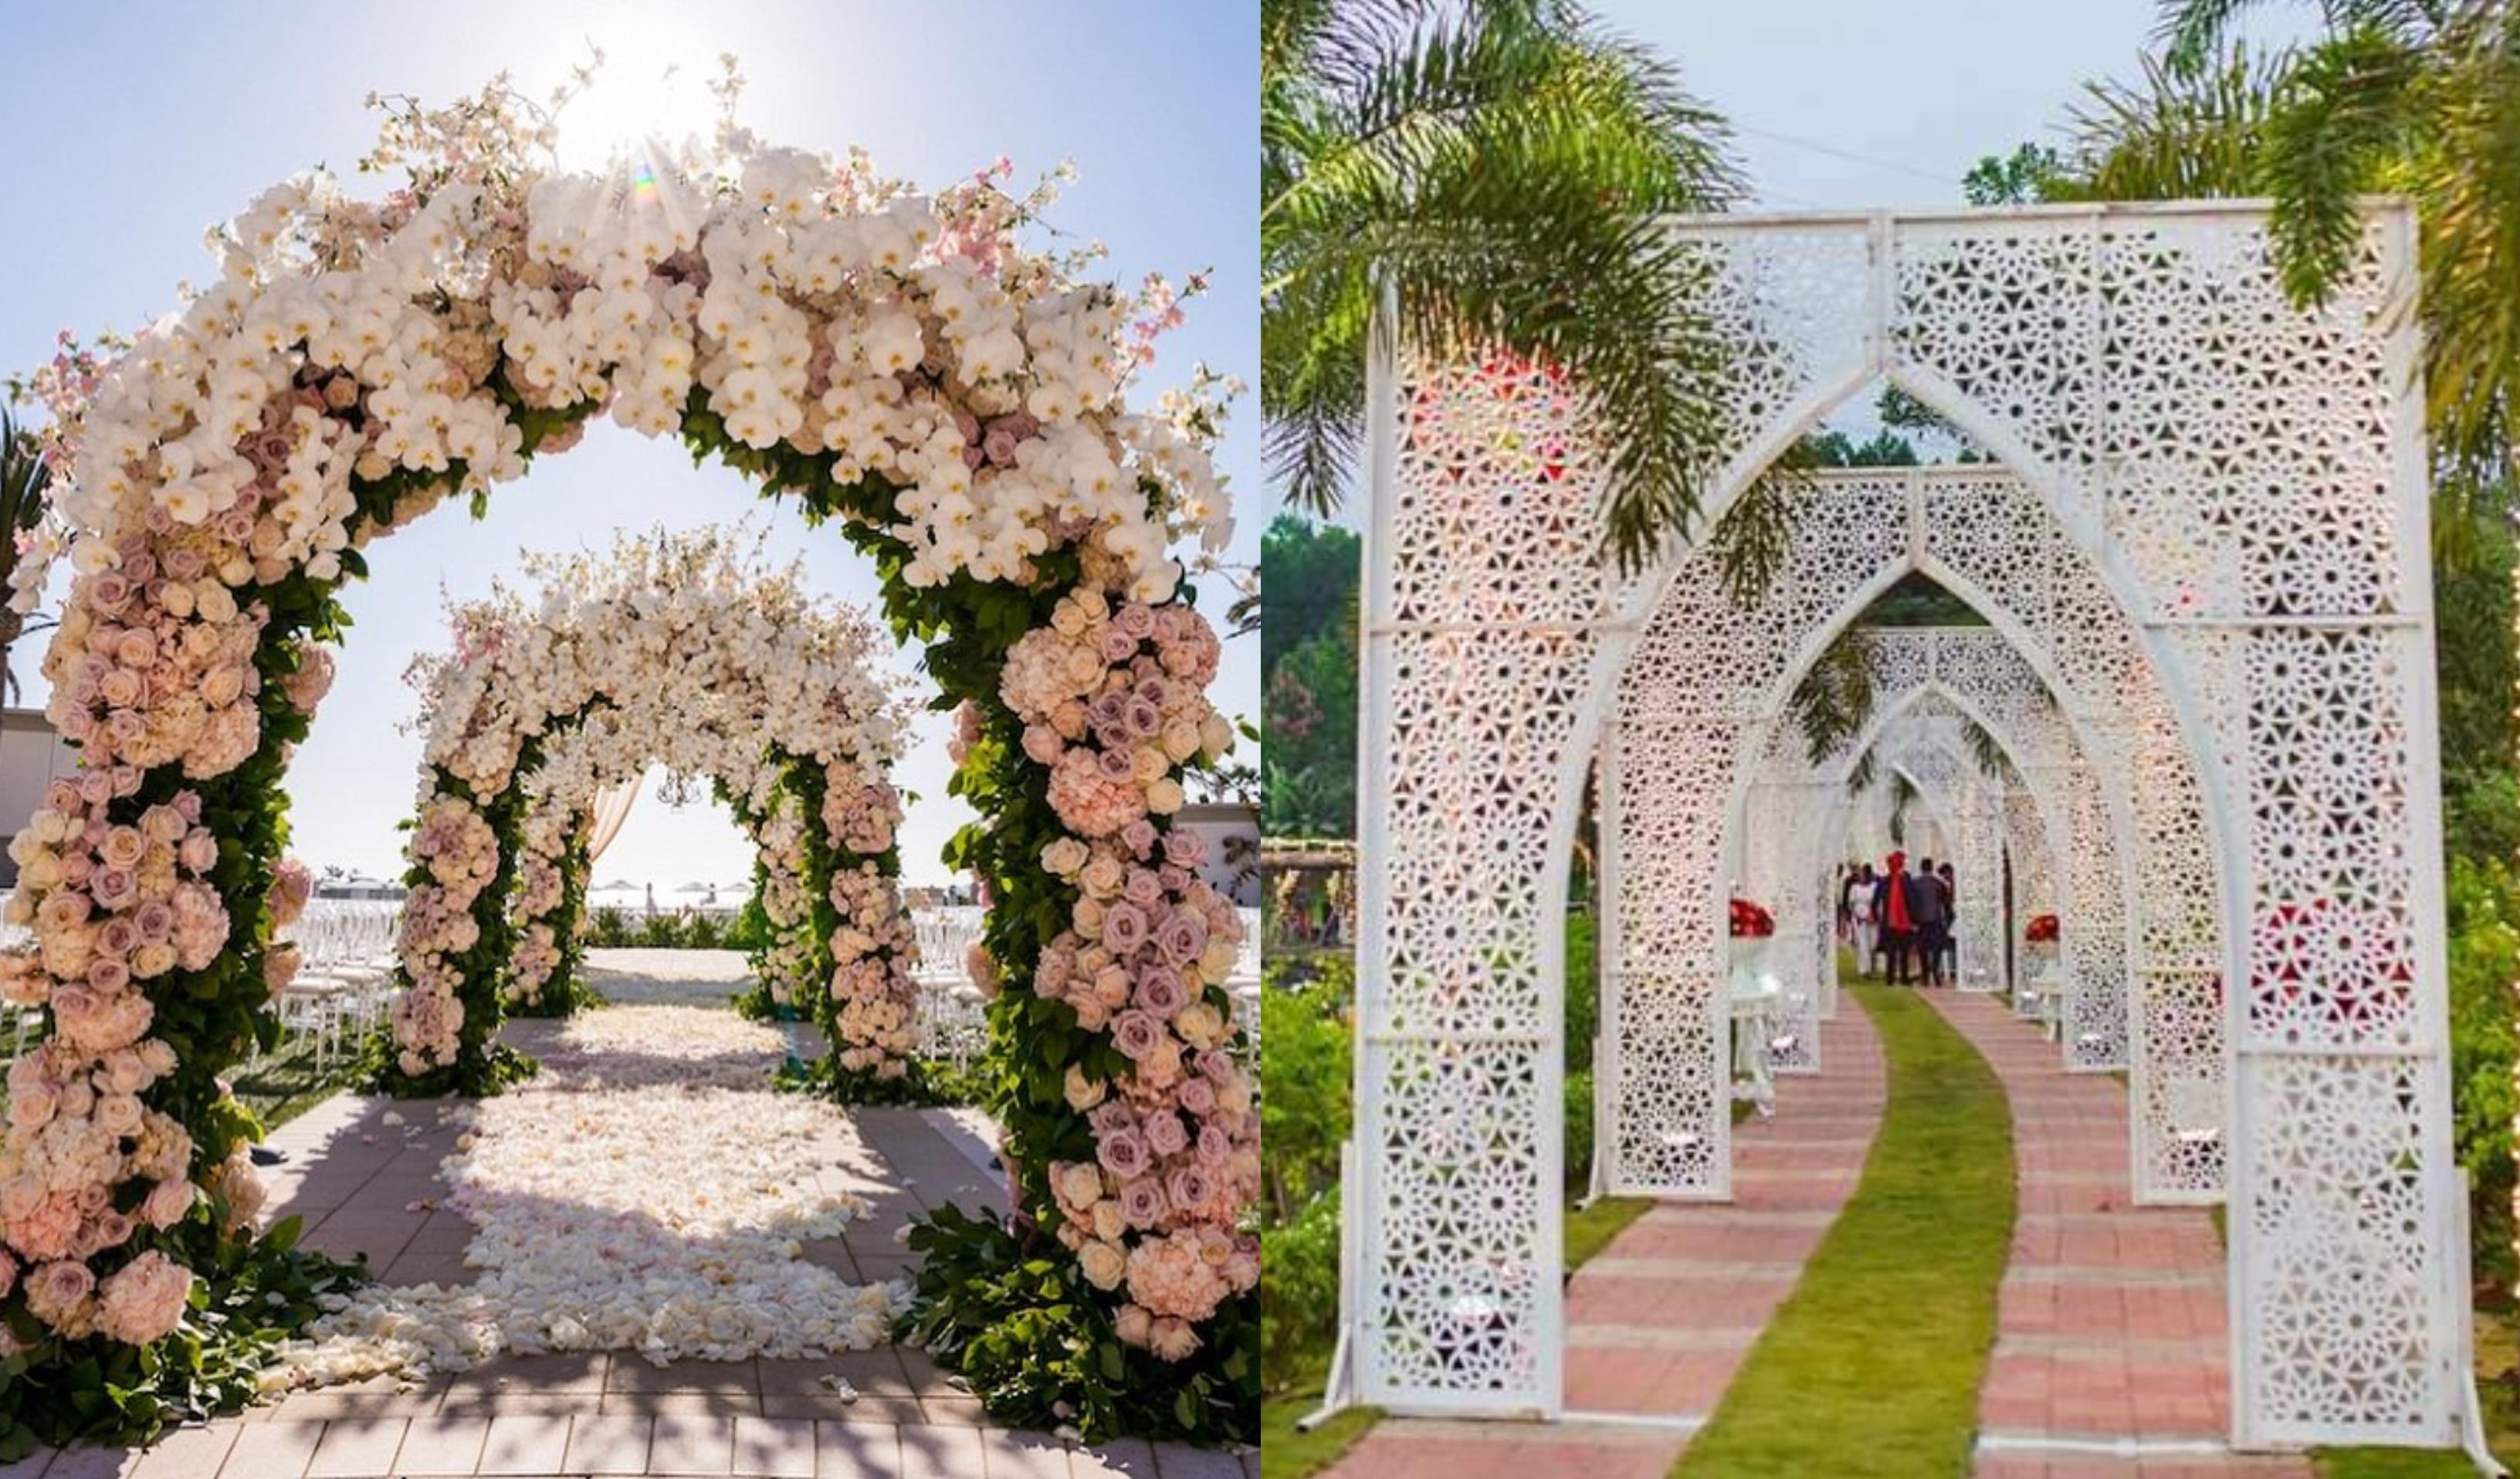 25 Magical Entrance Decor Ideas To Quirk Up Your Wedding Walkway Shaadisaga